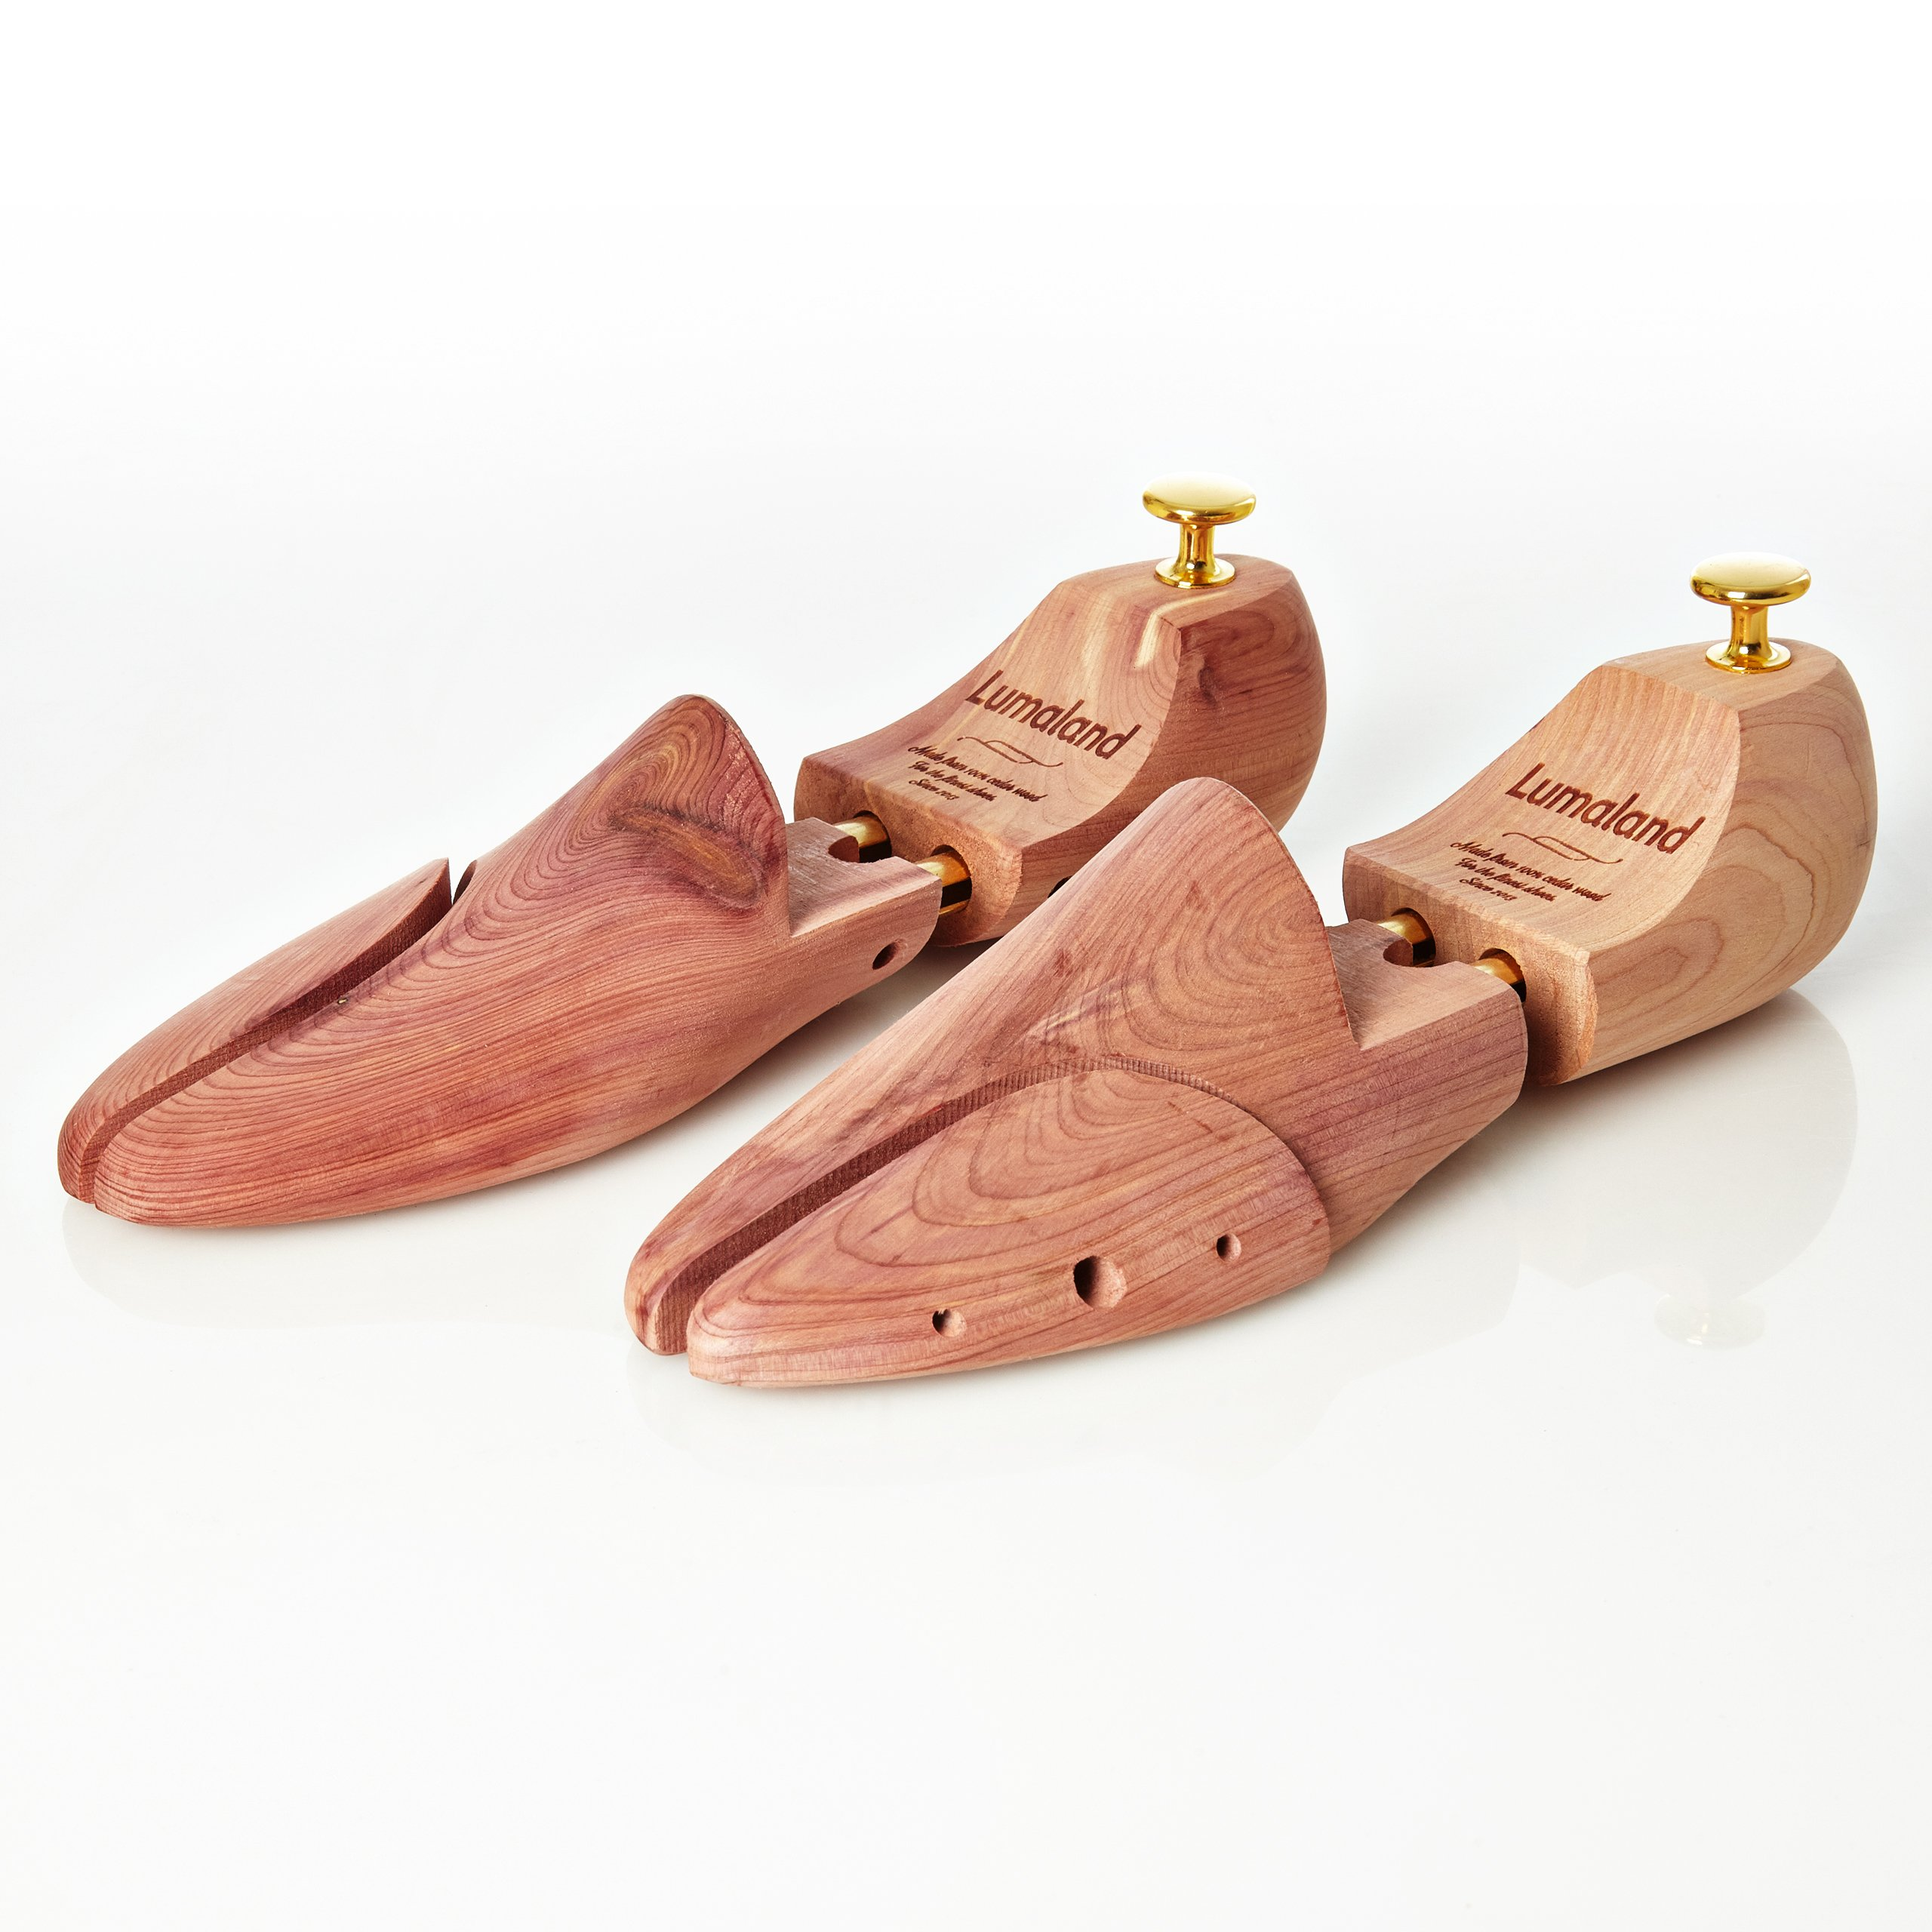 Top Embauchoirs Embauchoirs Top à chaussures selon les notes 8caf62